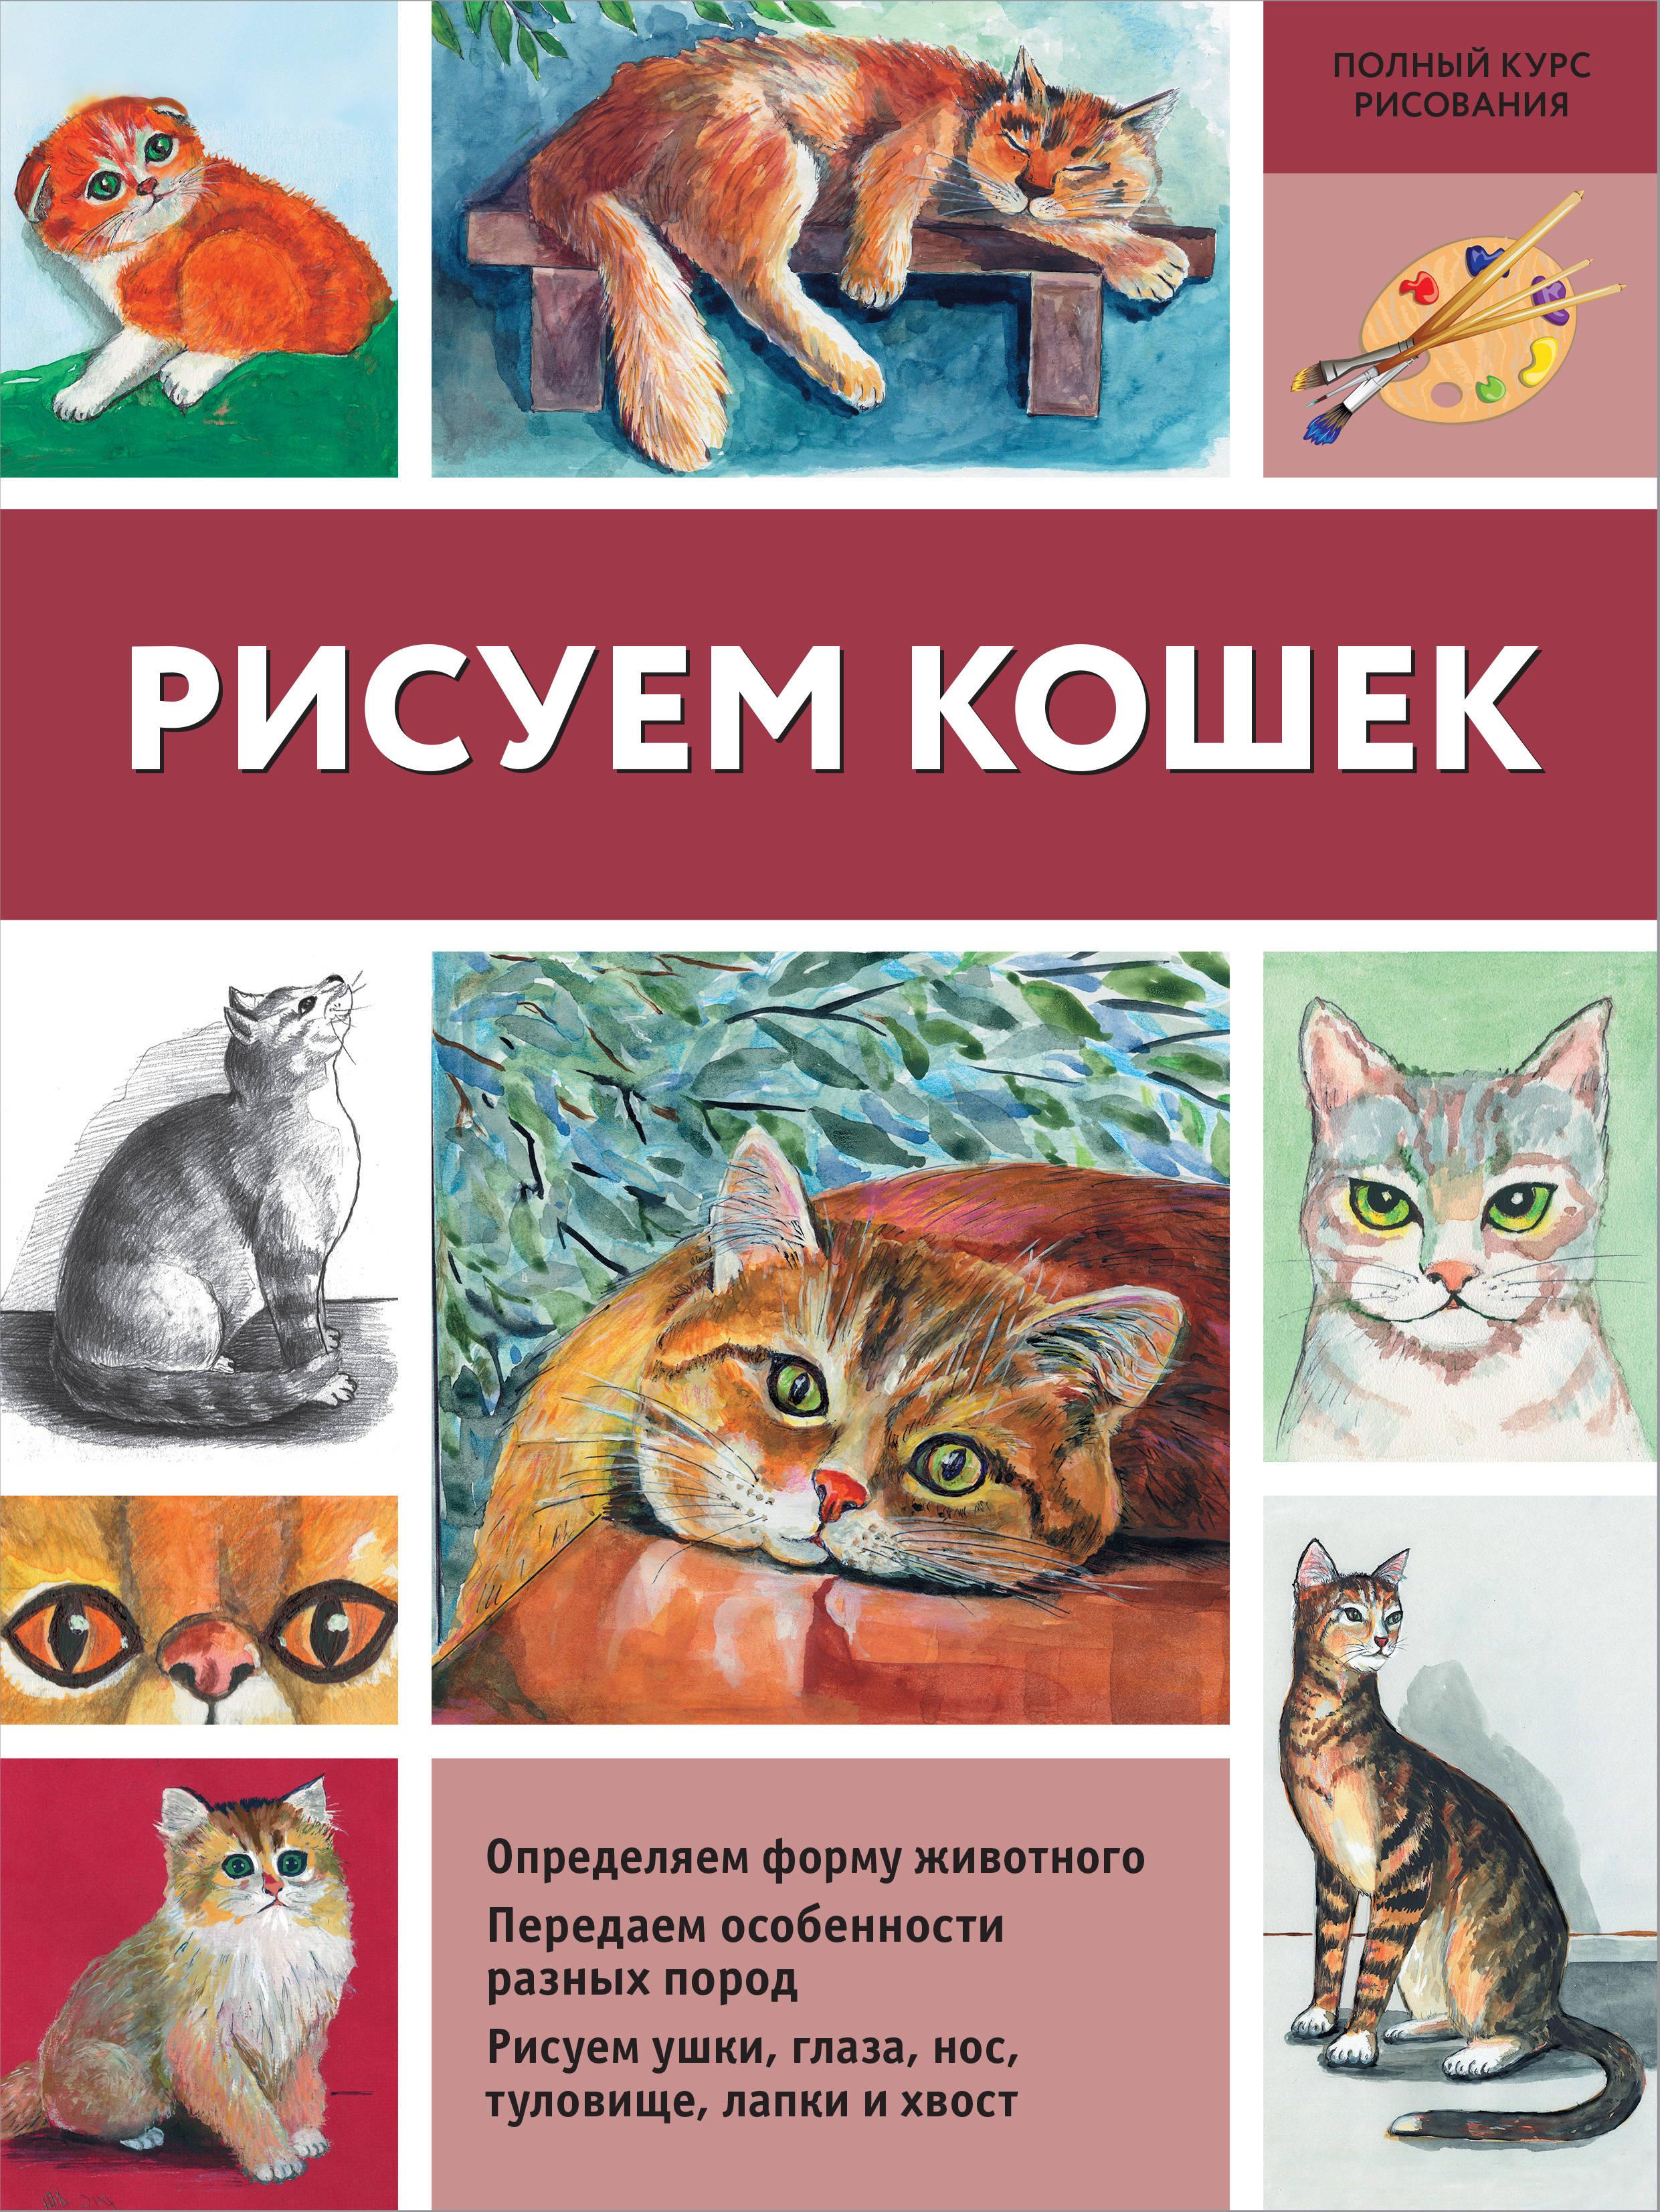 Рисуем кошек. Нина Щербакова